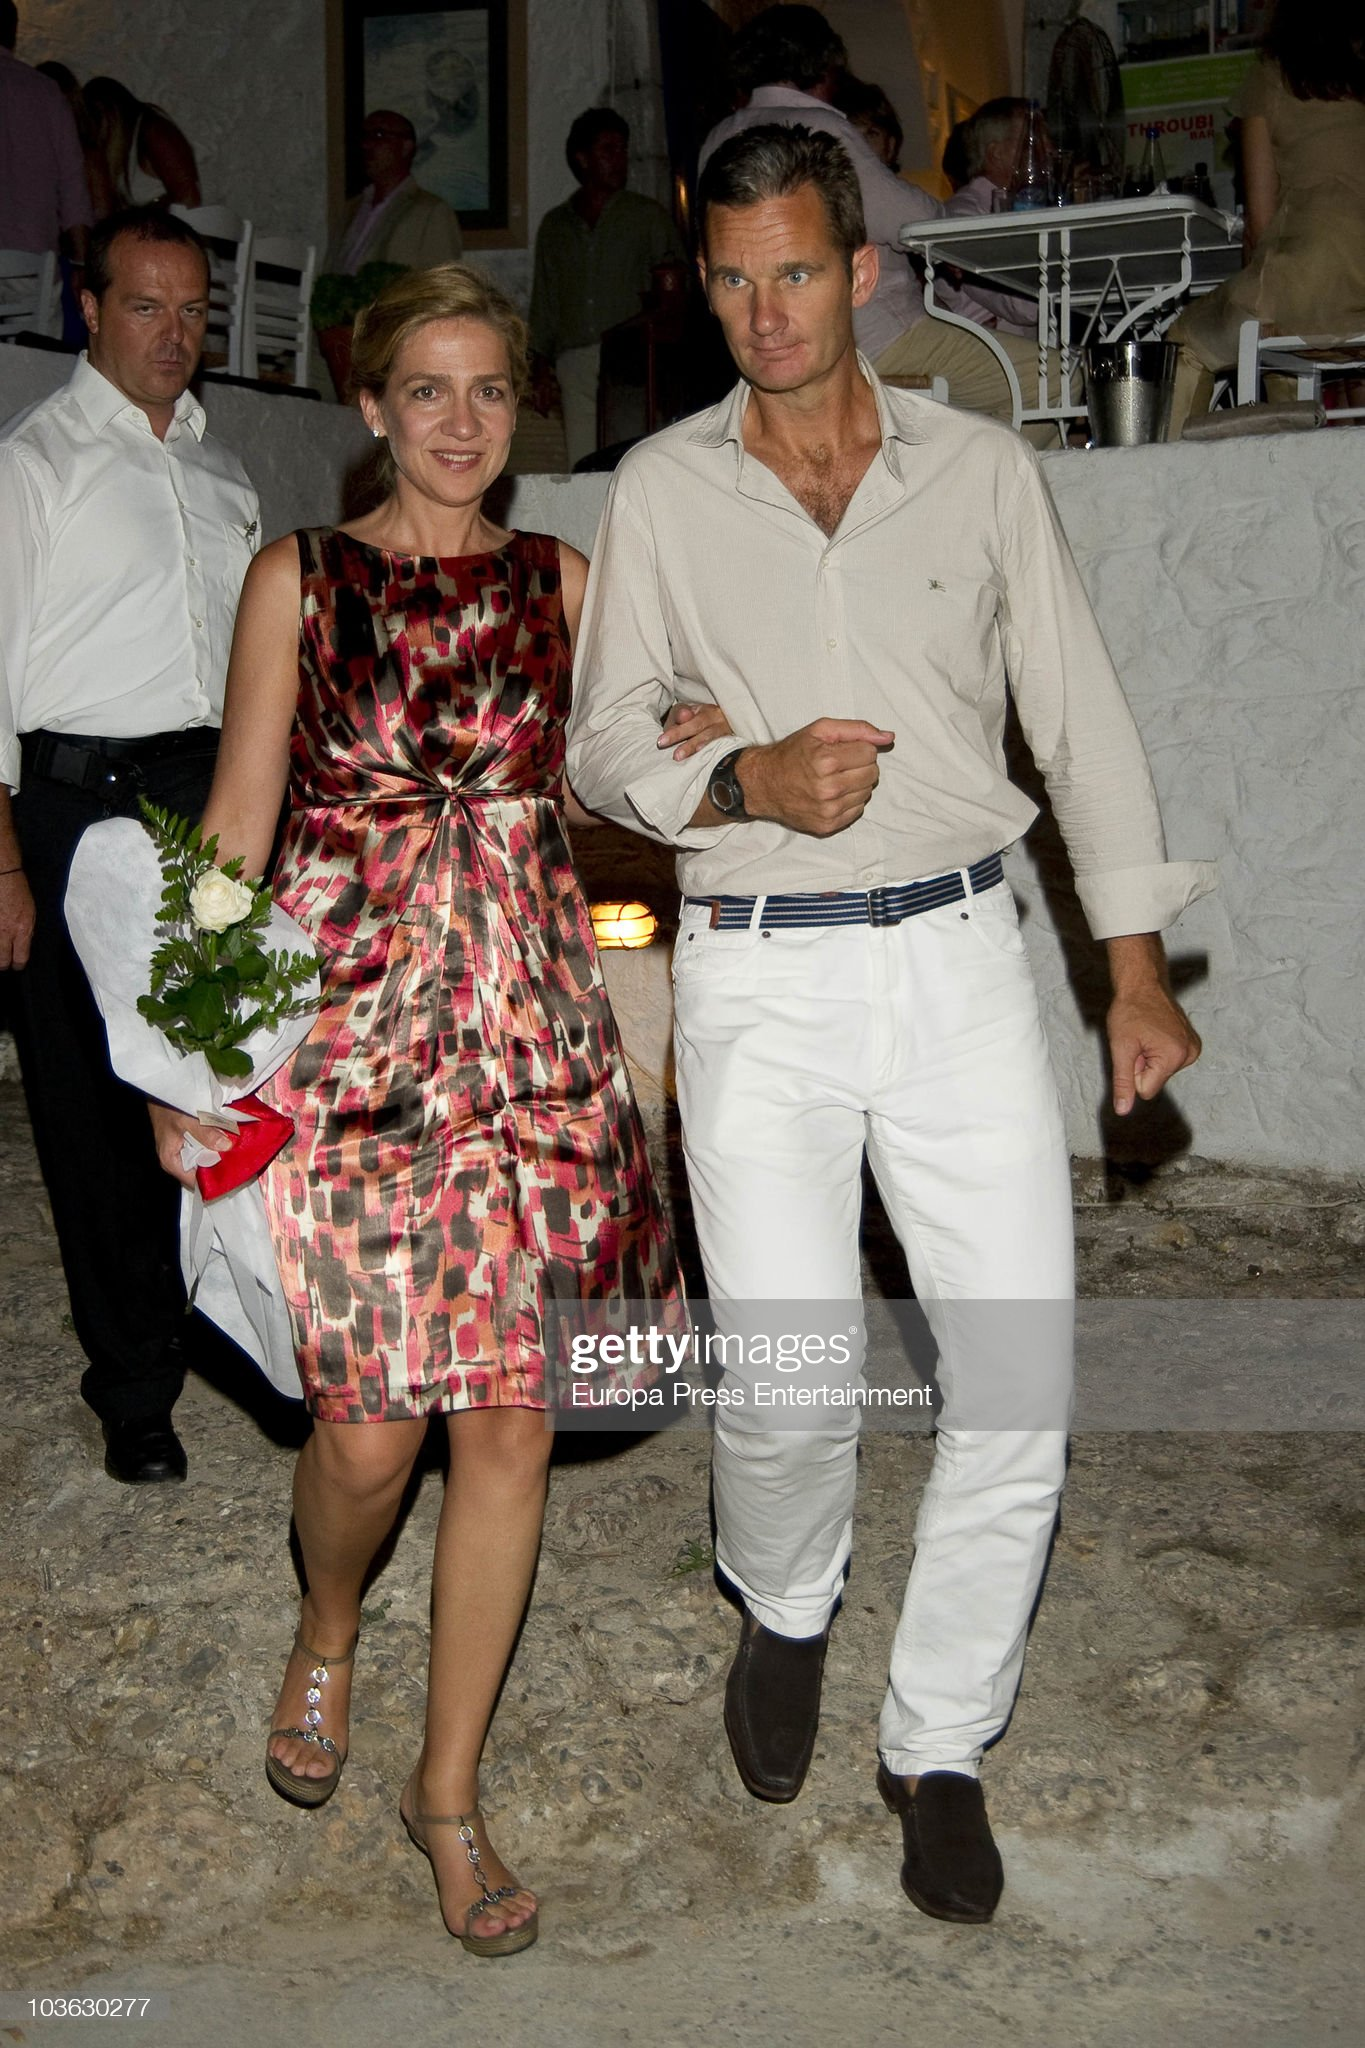 Wedding of Prince Nikolaos and Tatiana Blatnik - Dinner For Young People : News Photo